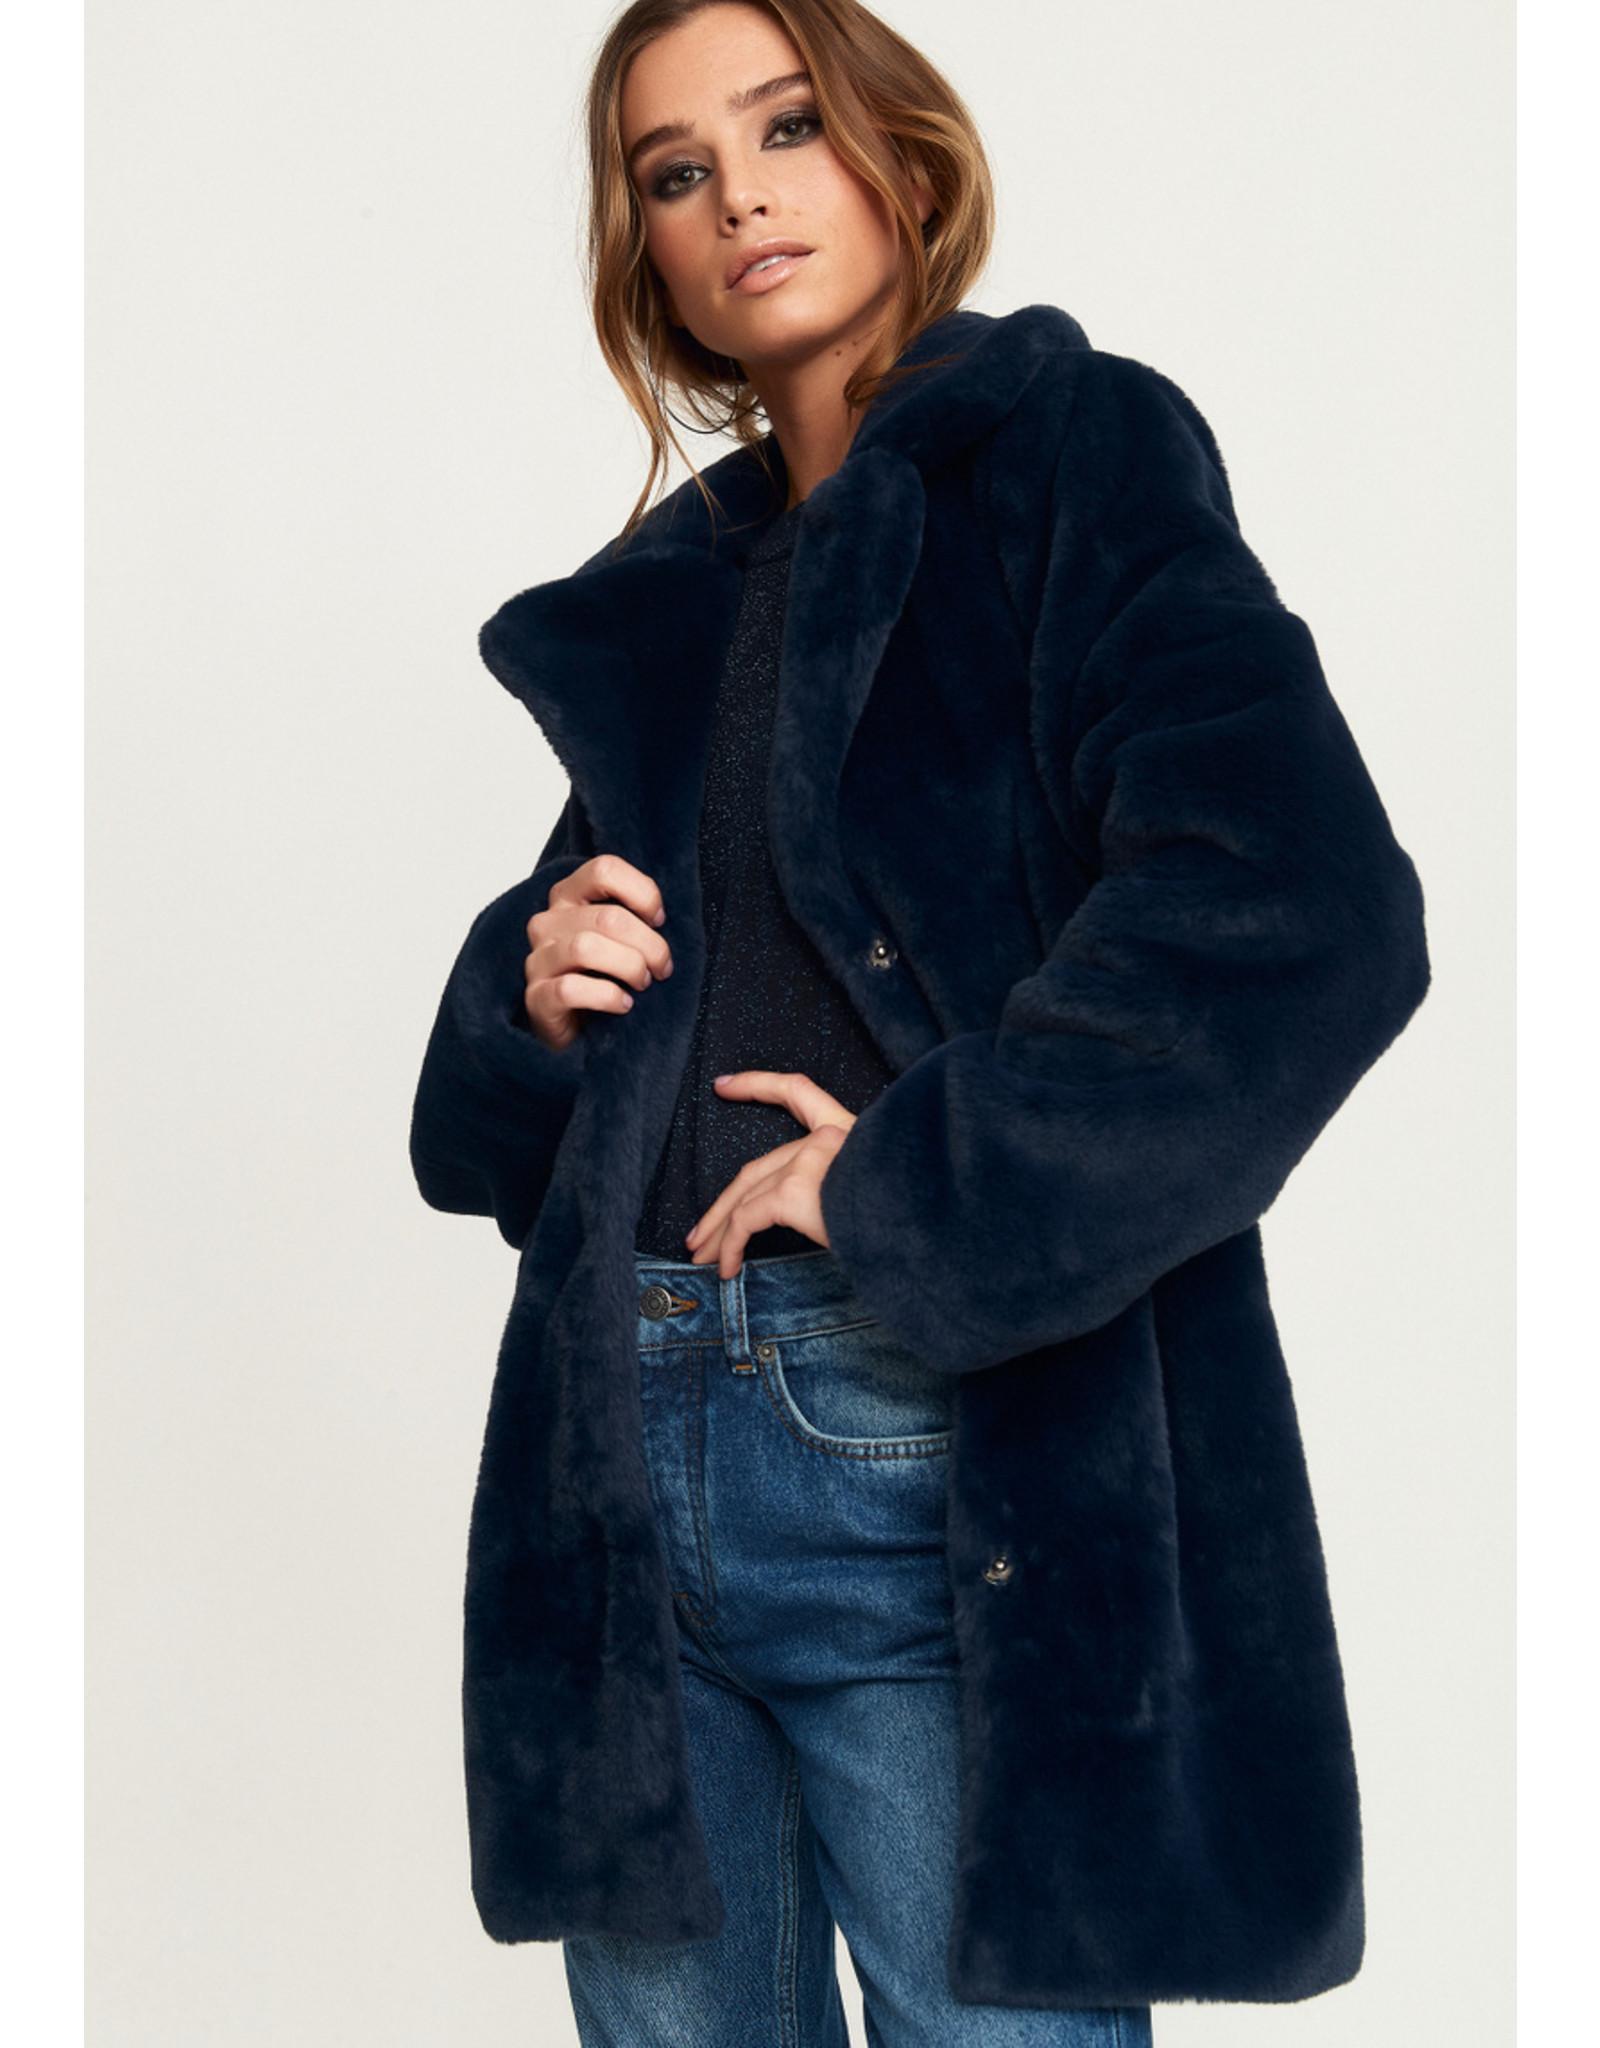 Rut & Circle Nova Faux Fur Jacket Midnight Navy